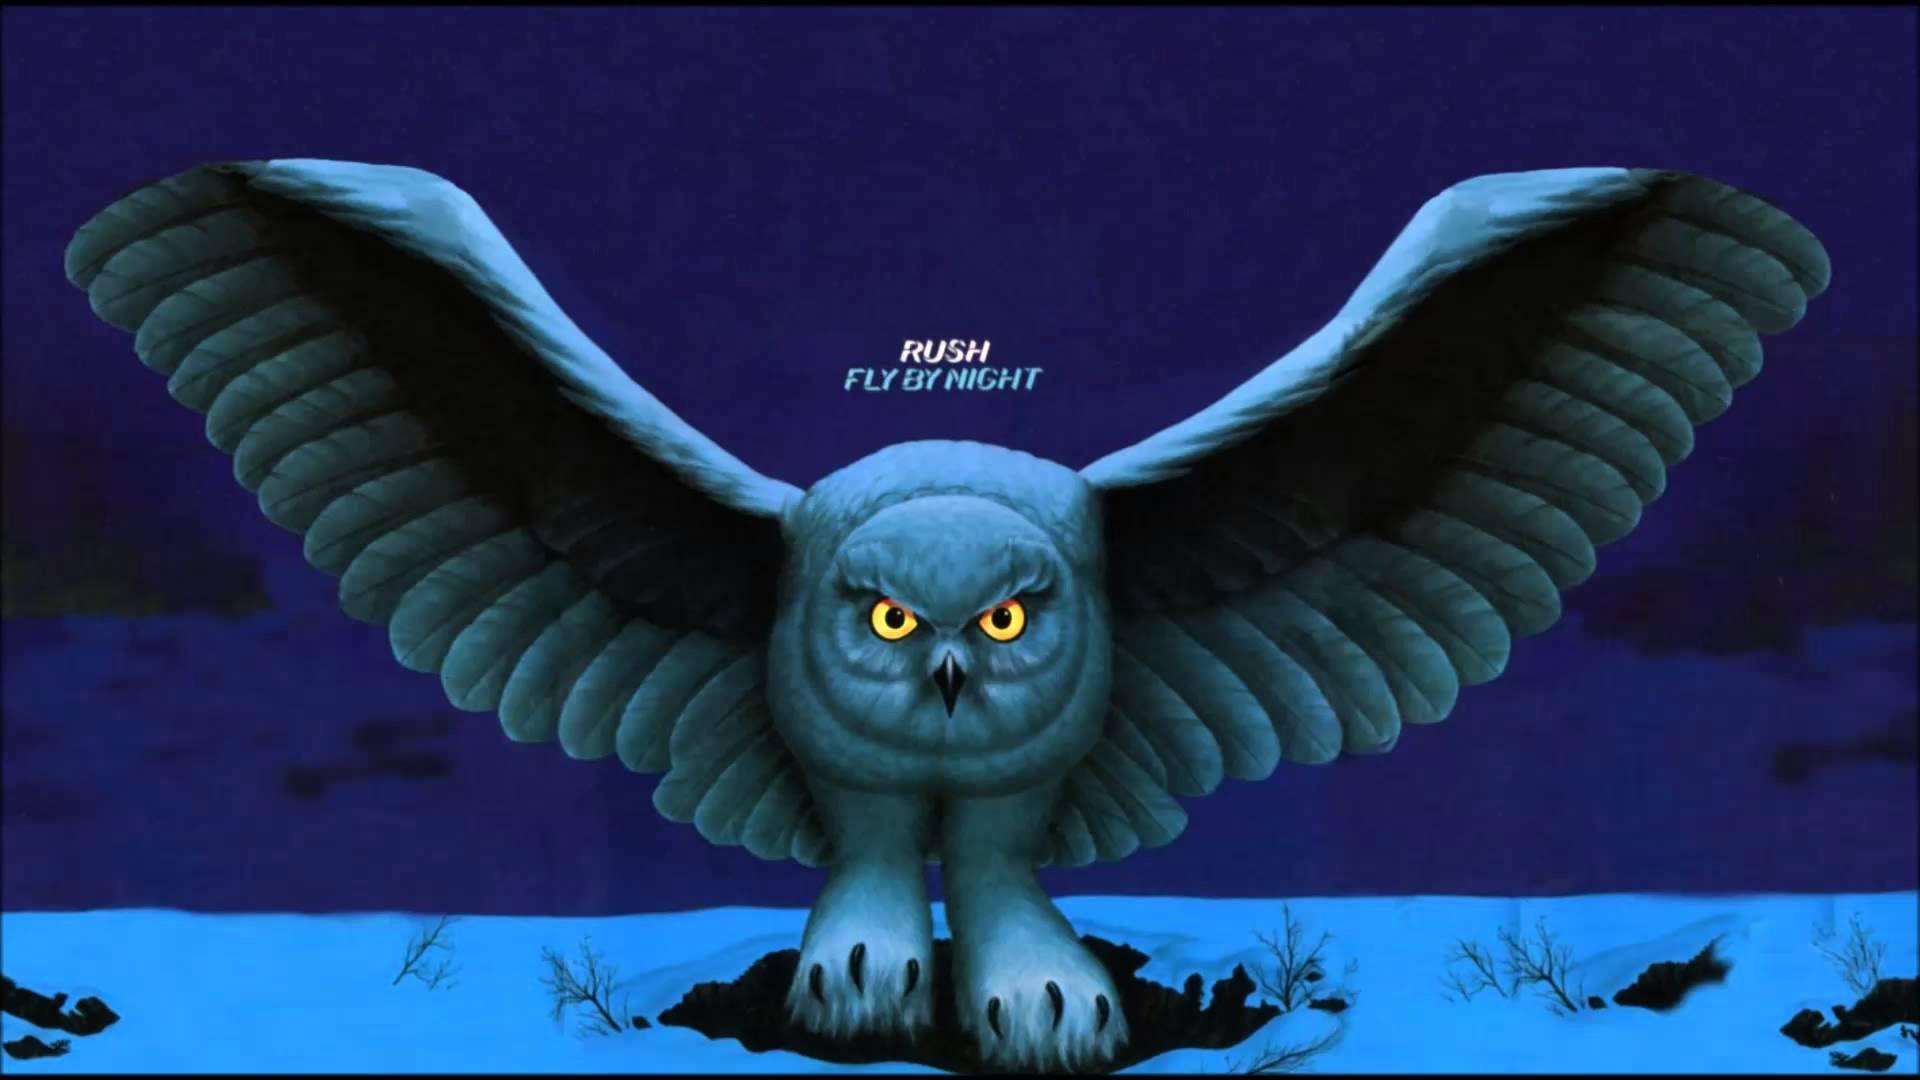 Rush Fly By Night Full Album HD HQ 1080p